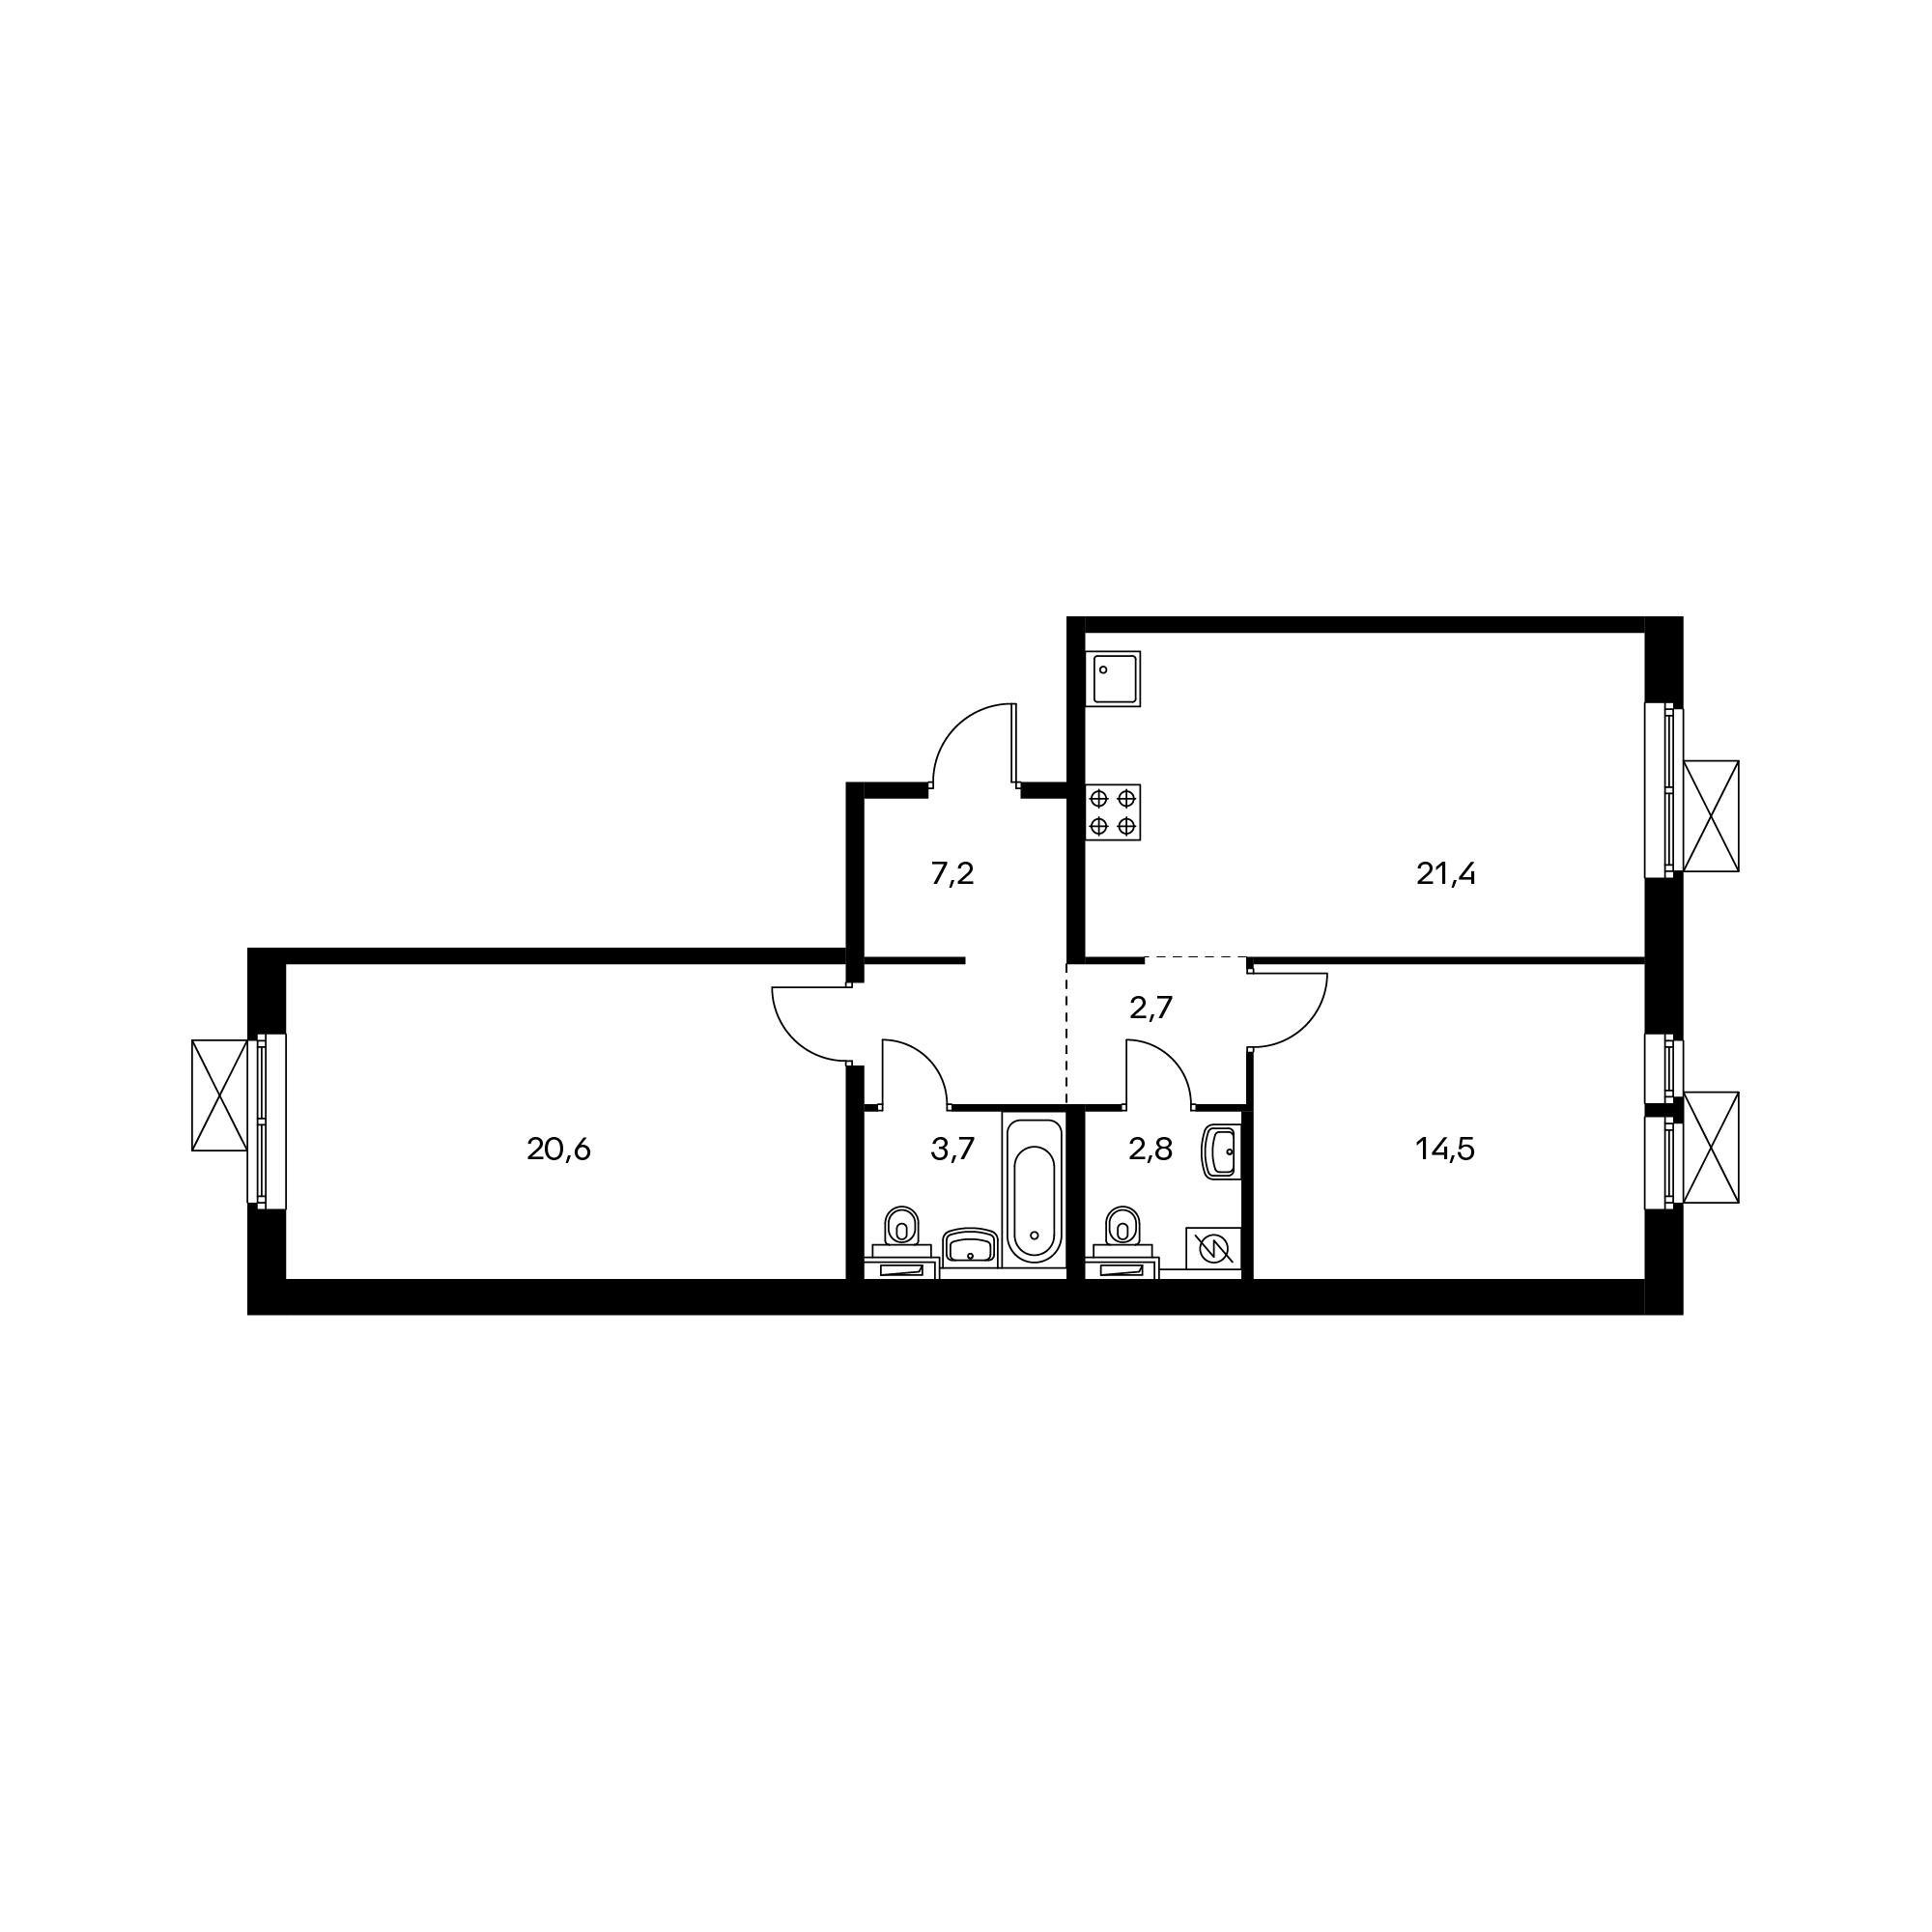 2EL3_7.2-3